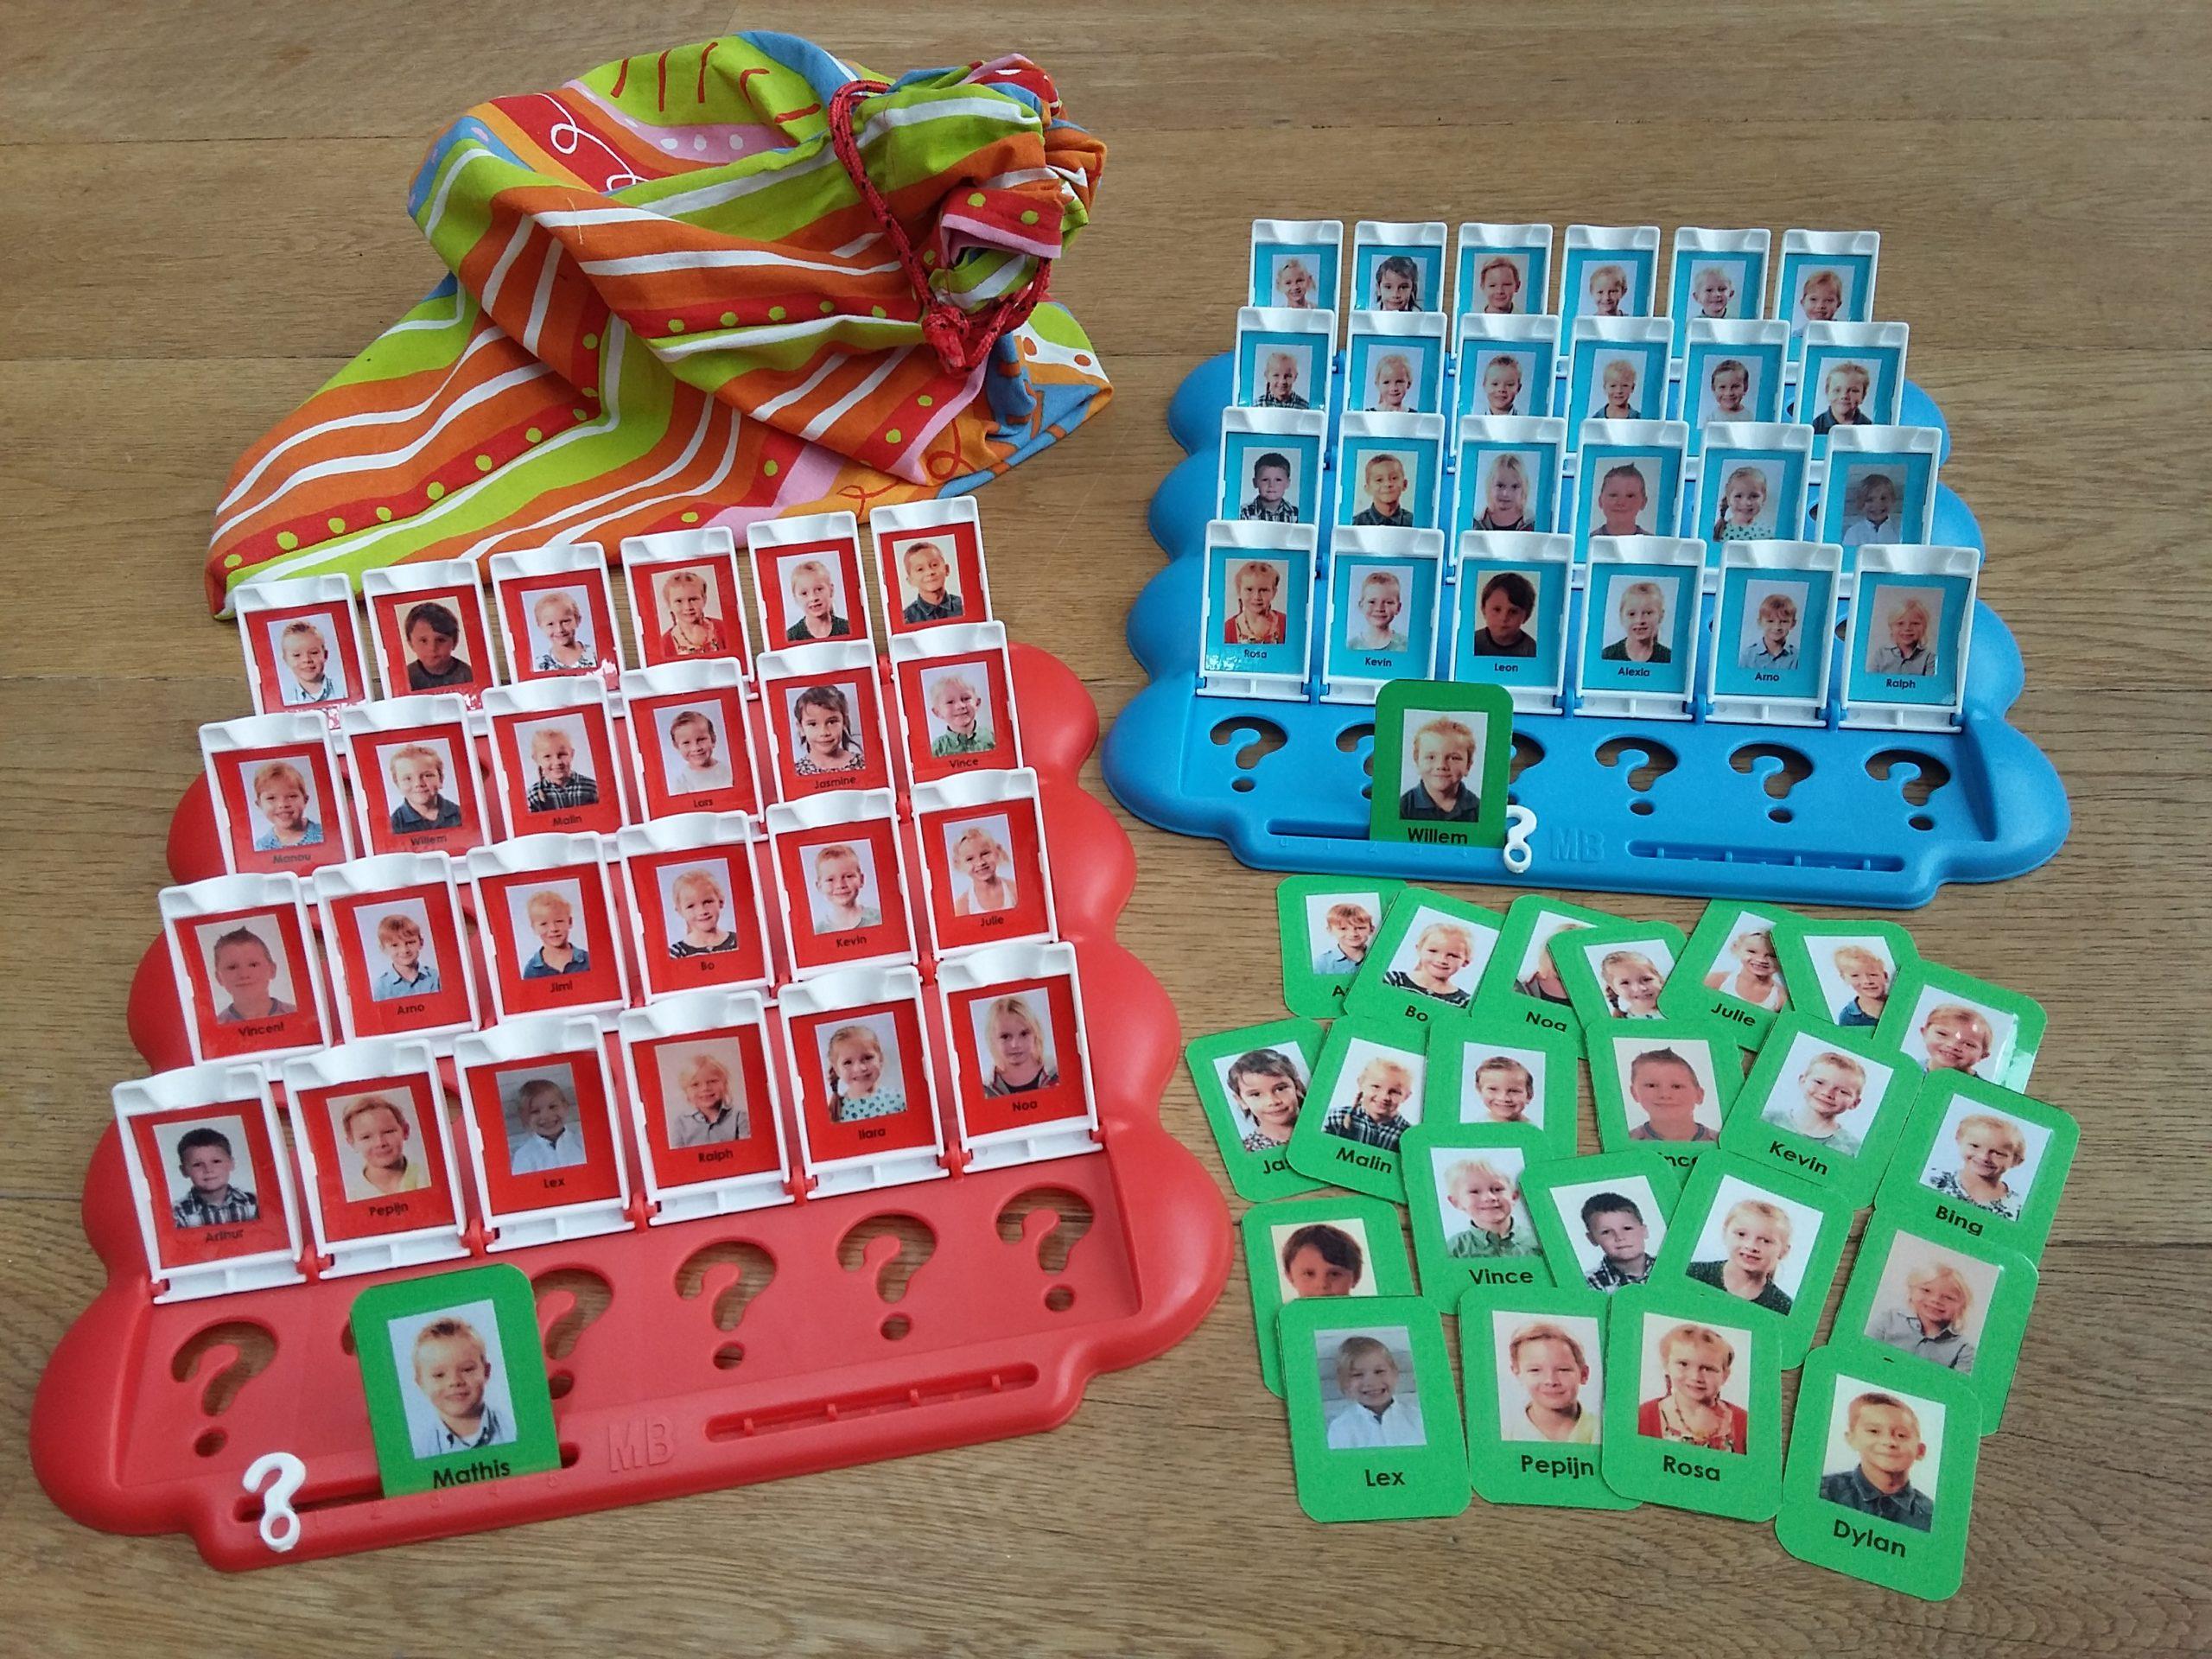 Hedendaags Spel 'wie is het' gepersonaliseerd! PV-84